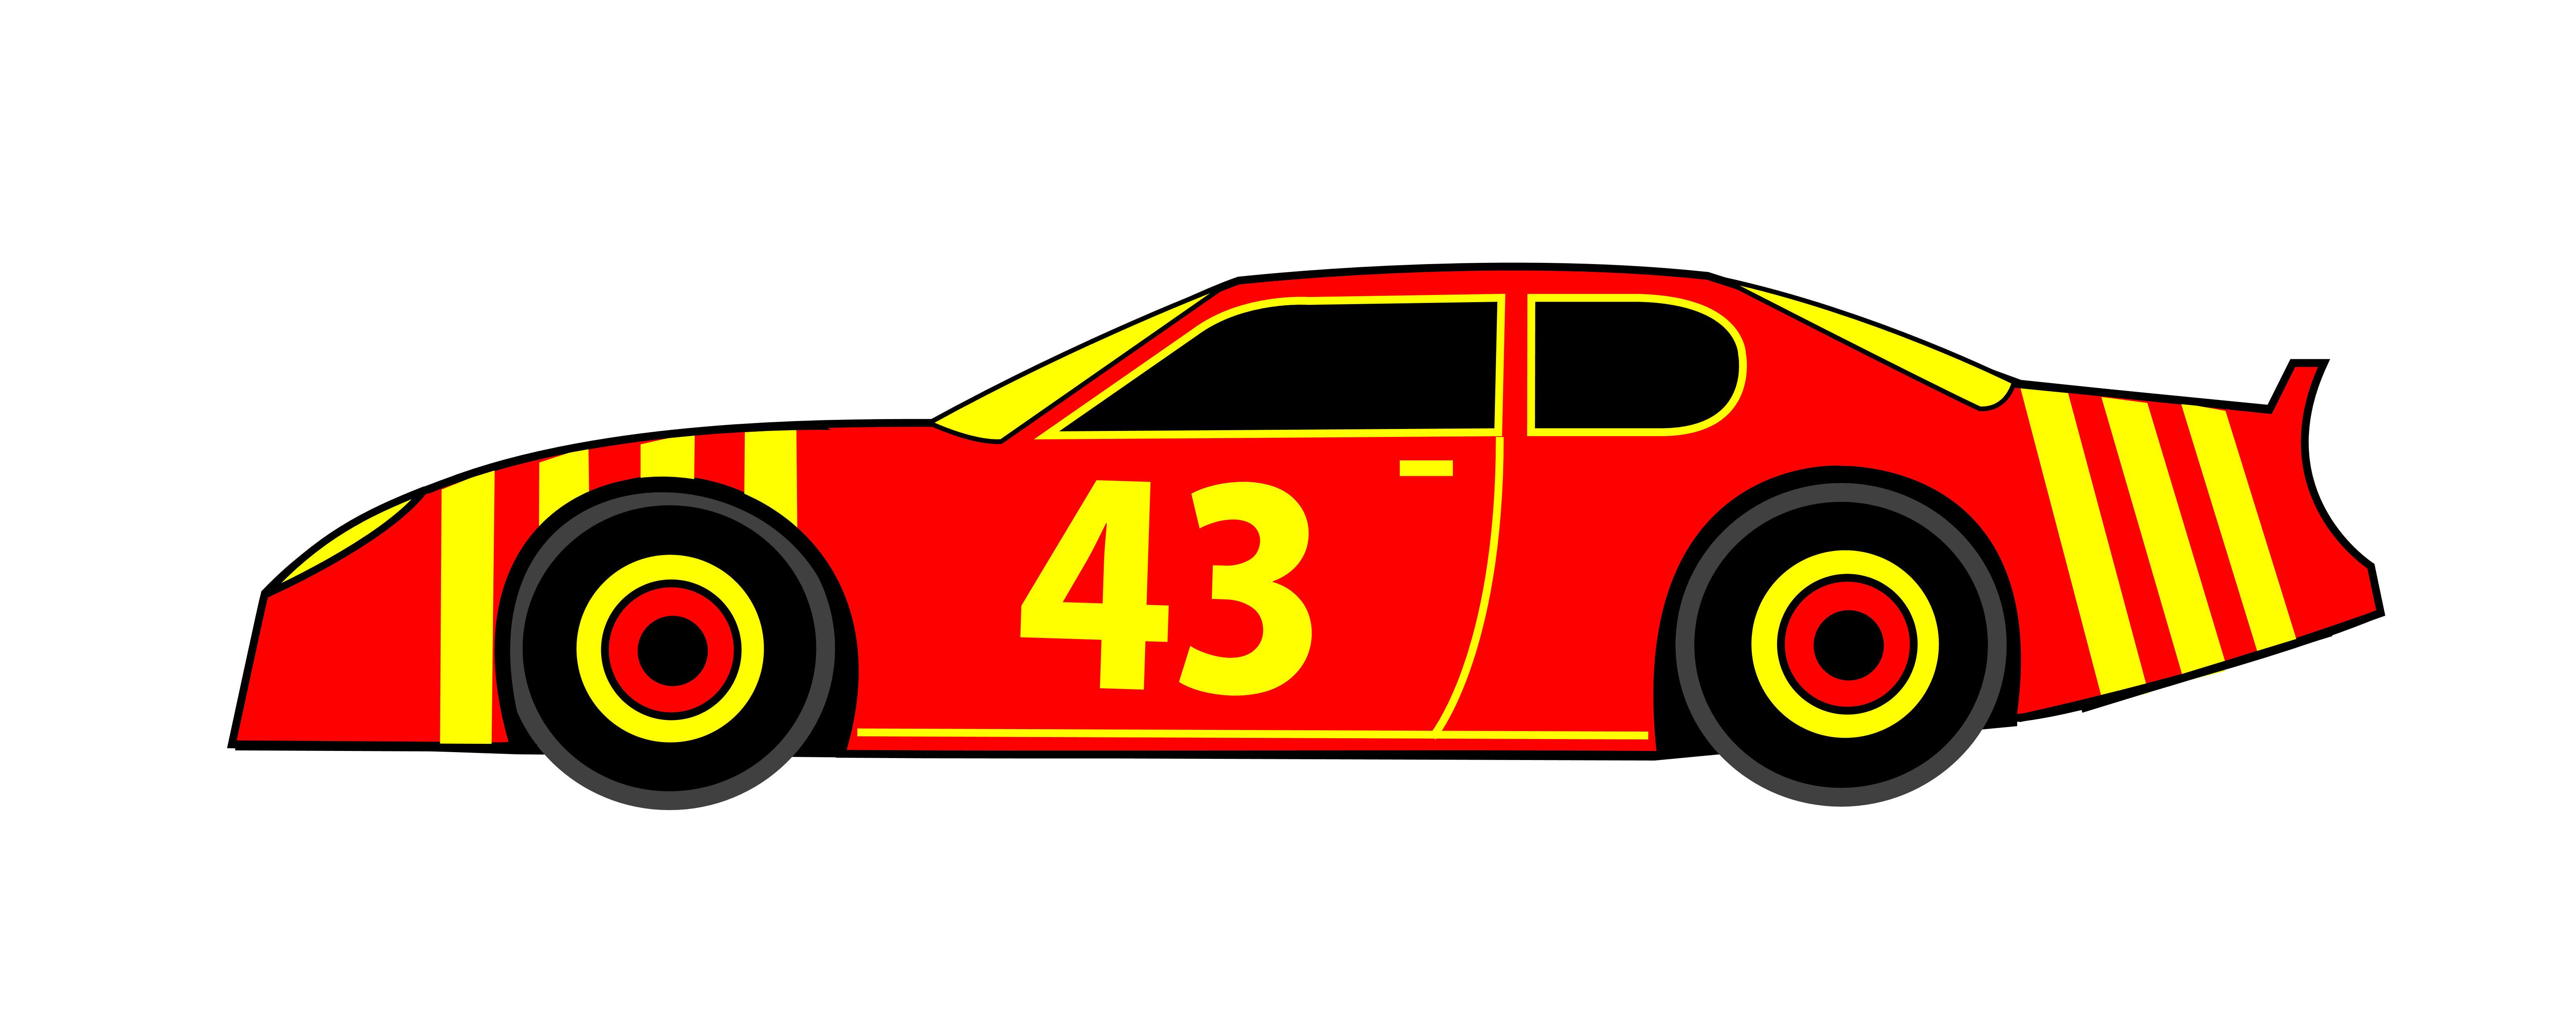 6500x2555 Red Race Car Clipart Clipartfest